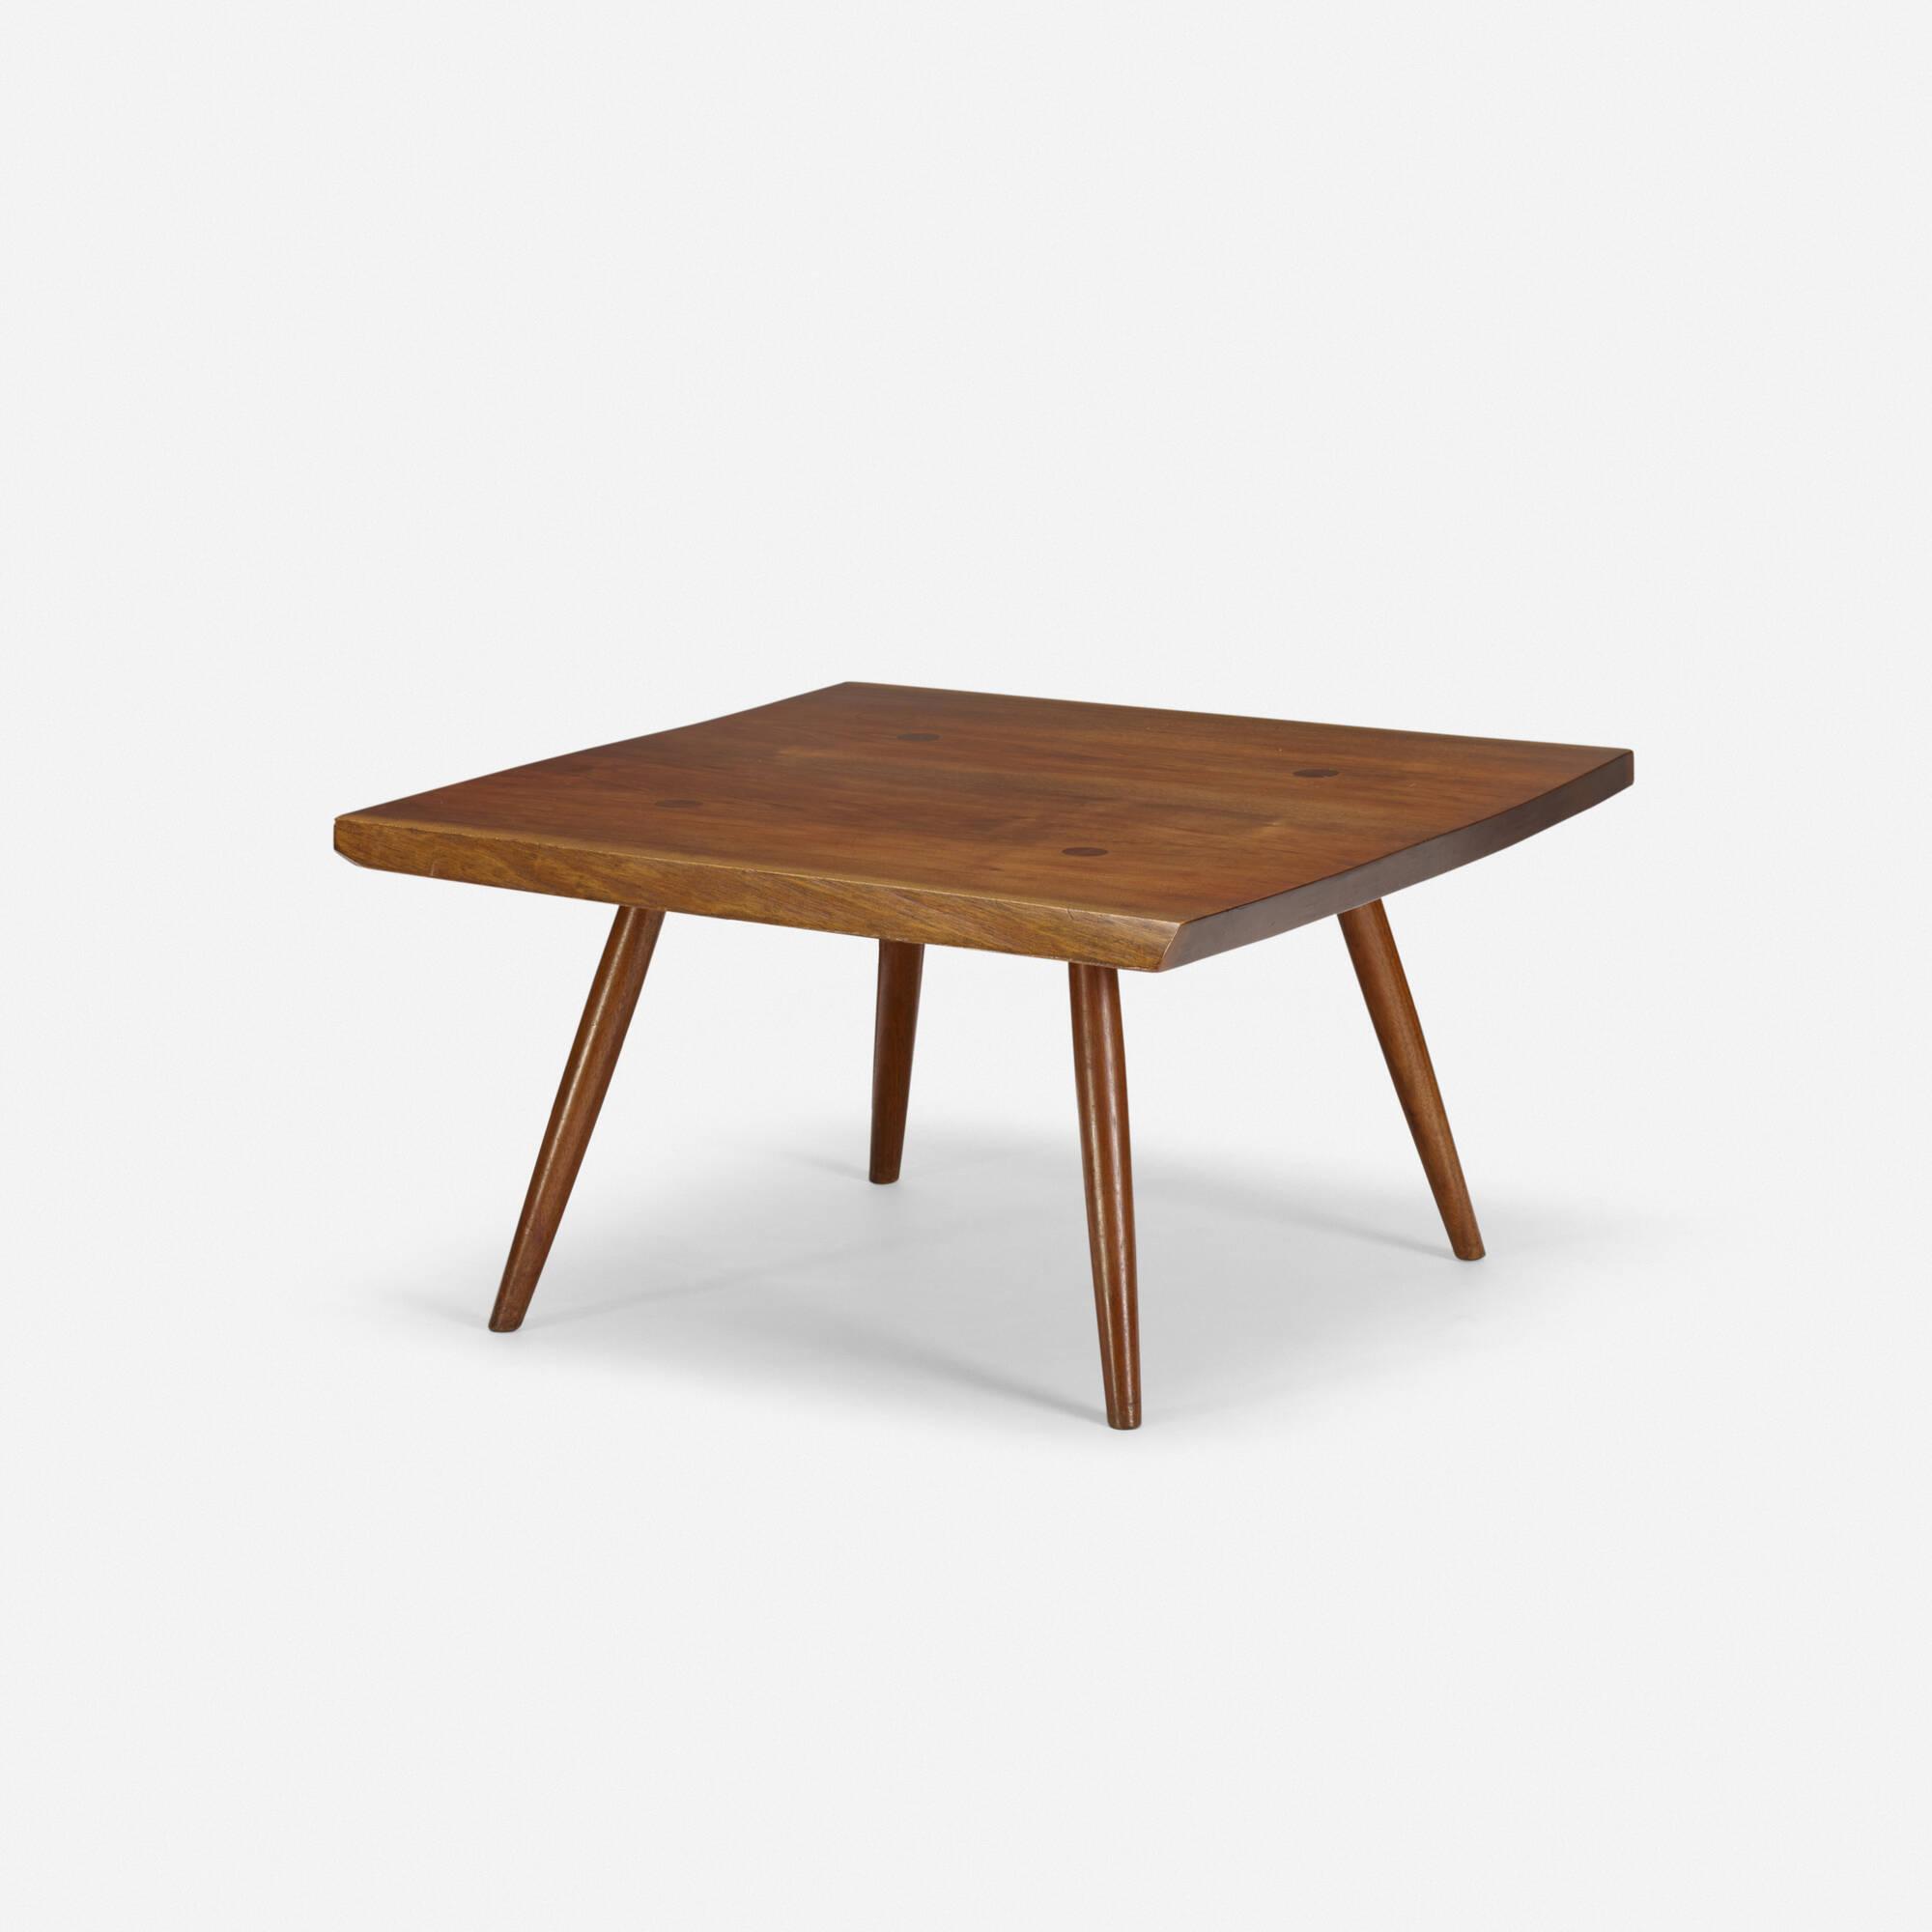 315 george nakashima coffee table art design 12 october